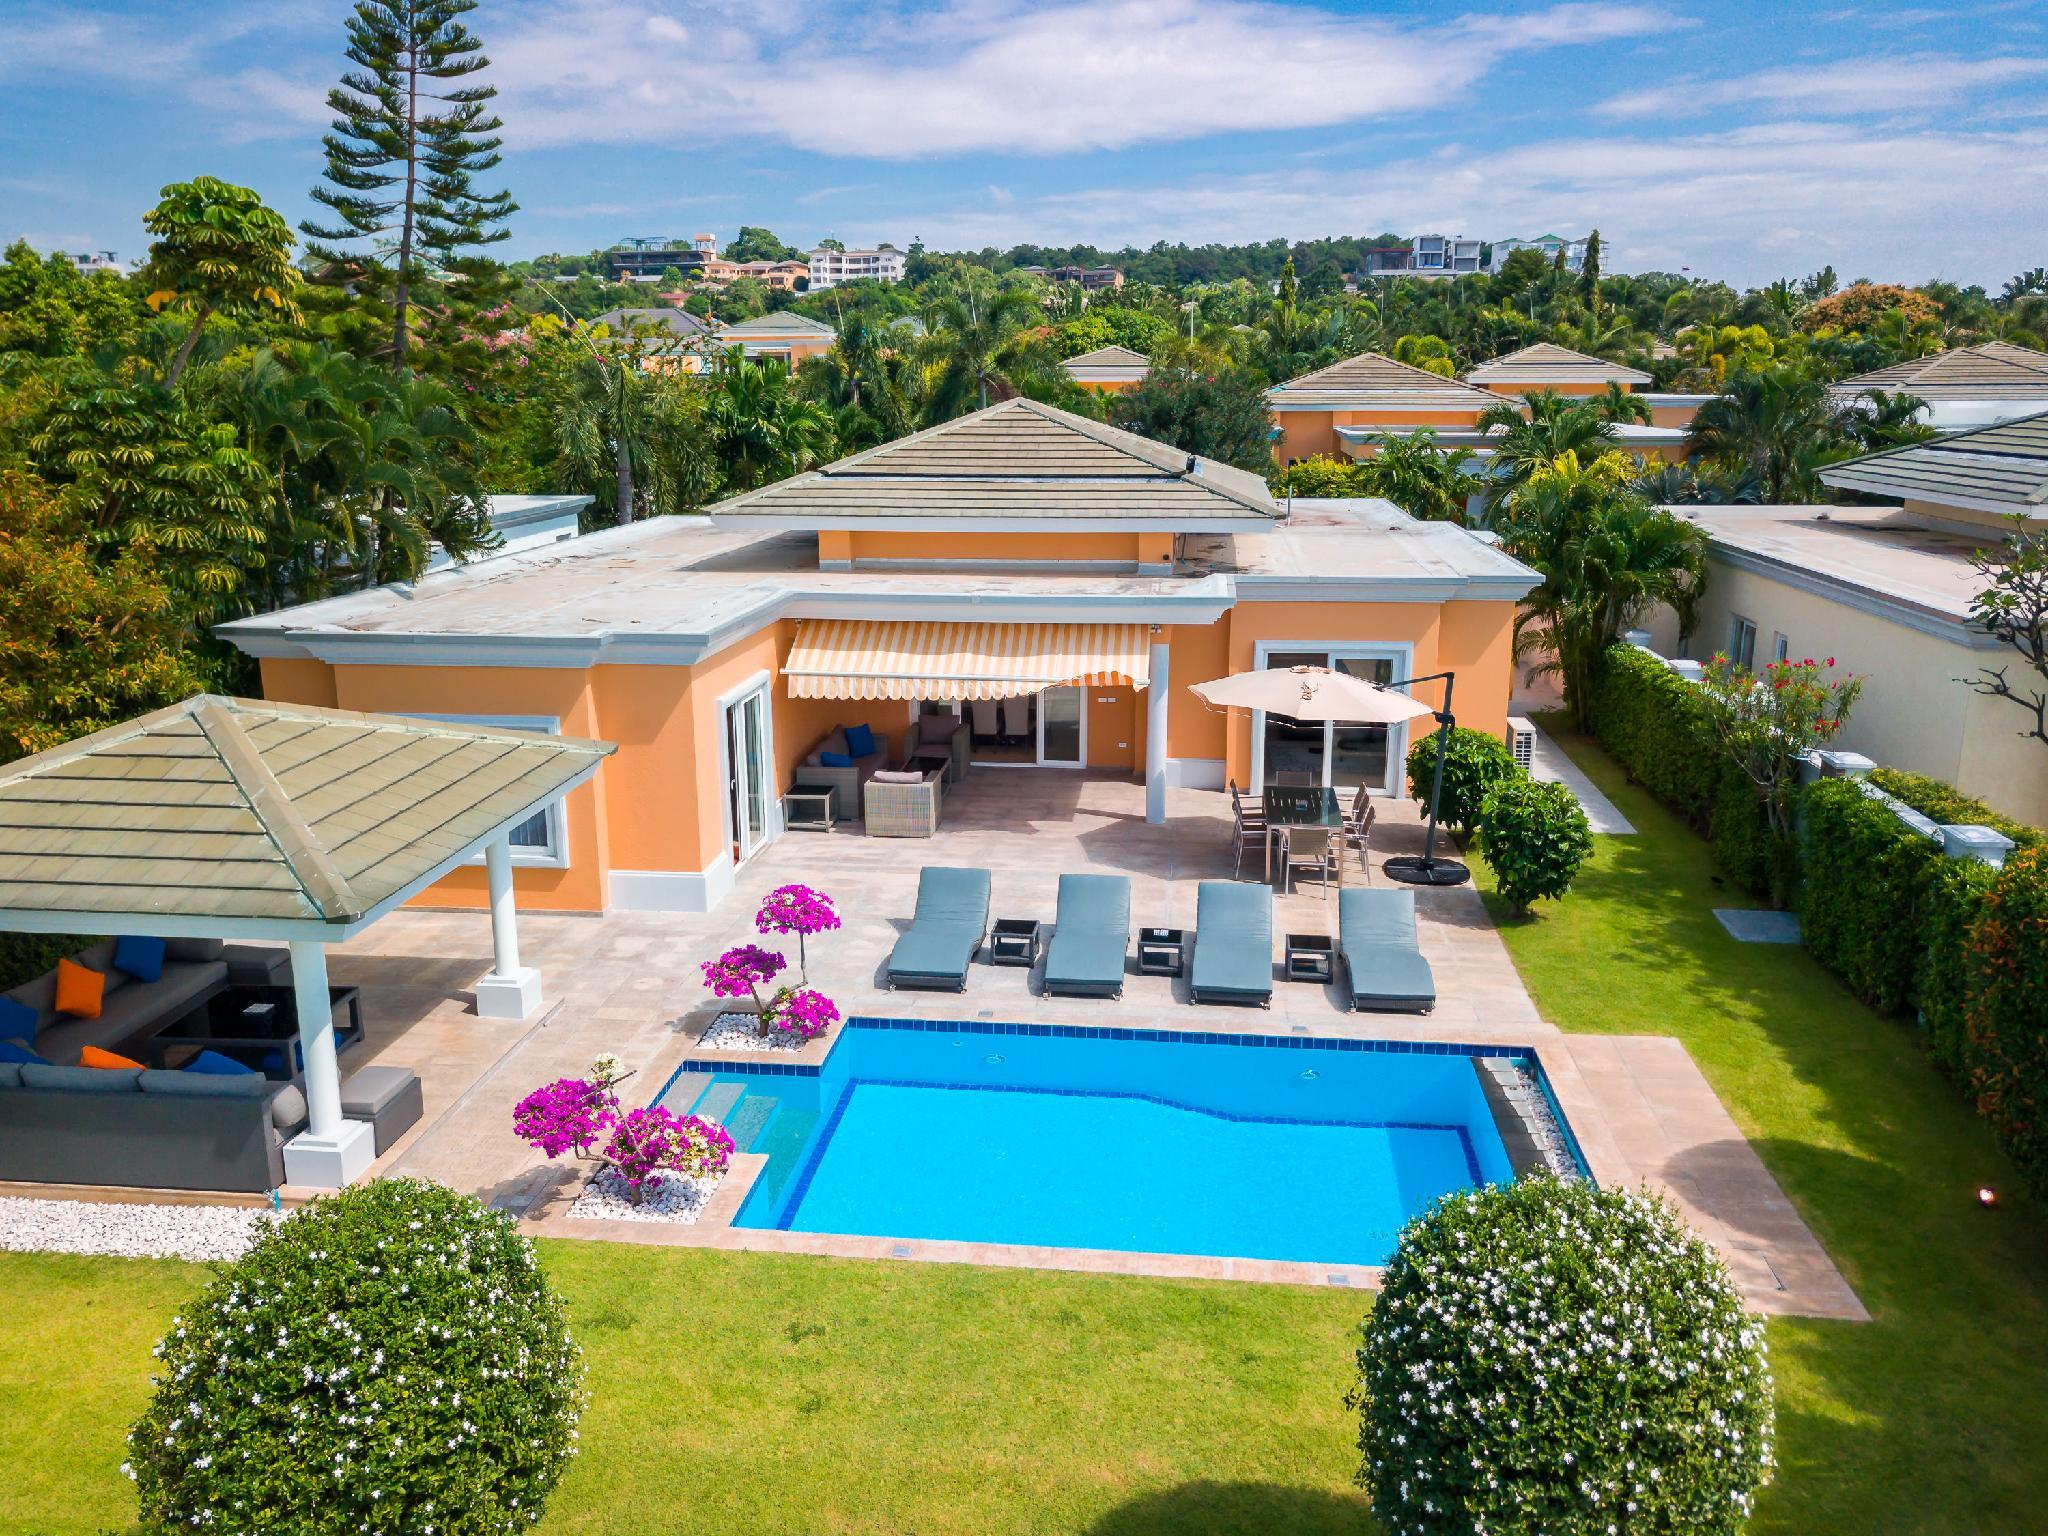 Luxury Pool Villa 604 / 4 BR 8-10 Persons Reviews